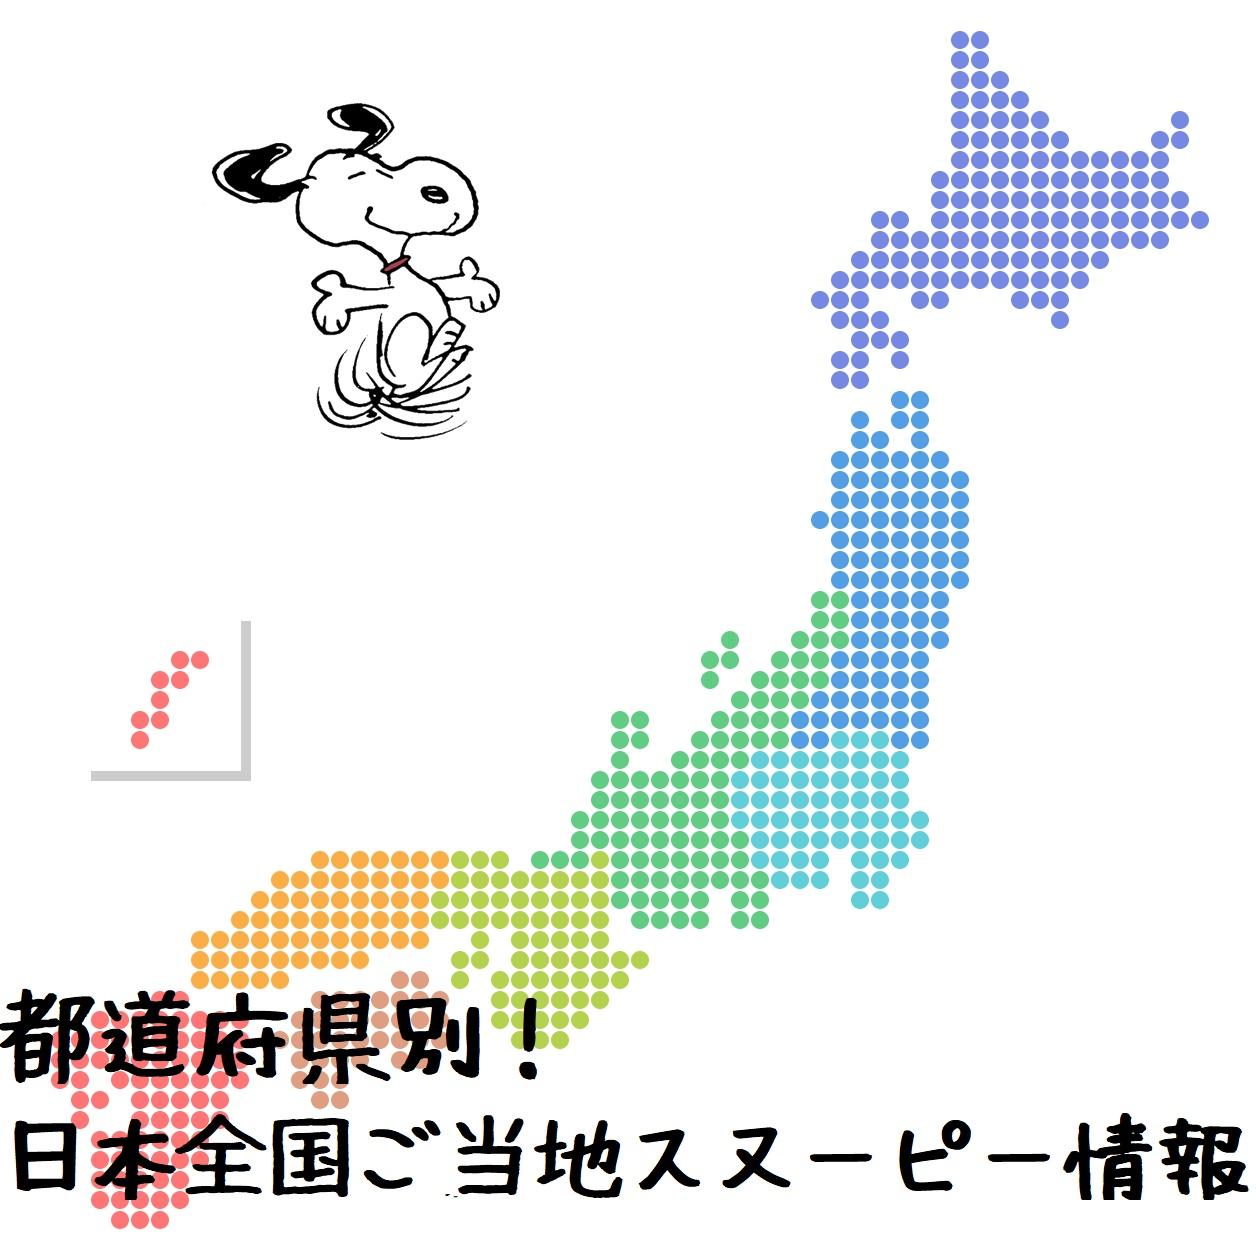 スヌーピー情報都道府県別日本全国地域別ファン地元観光1